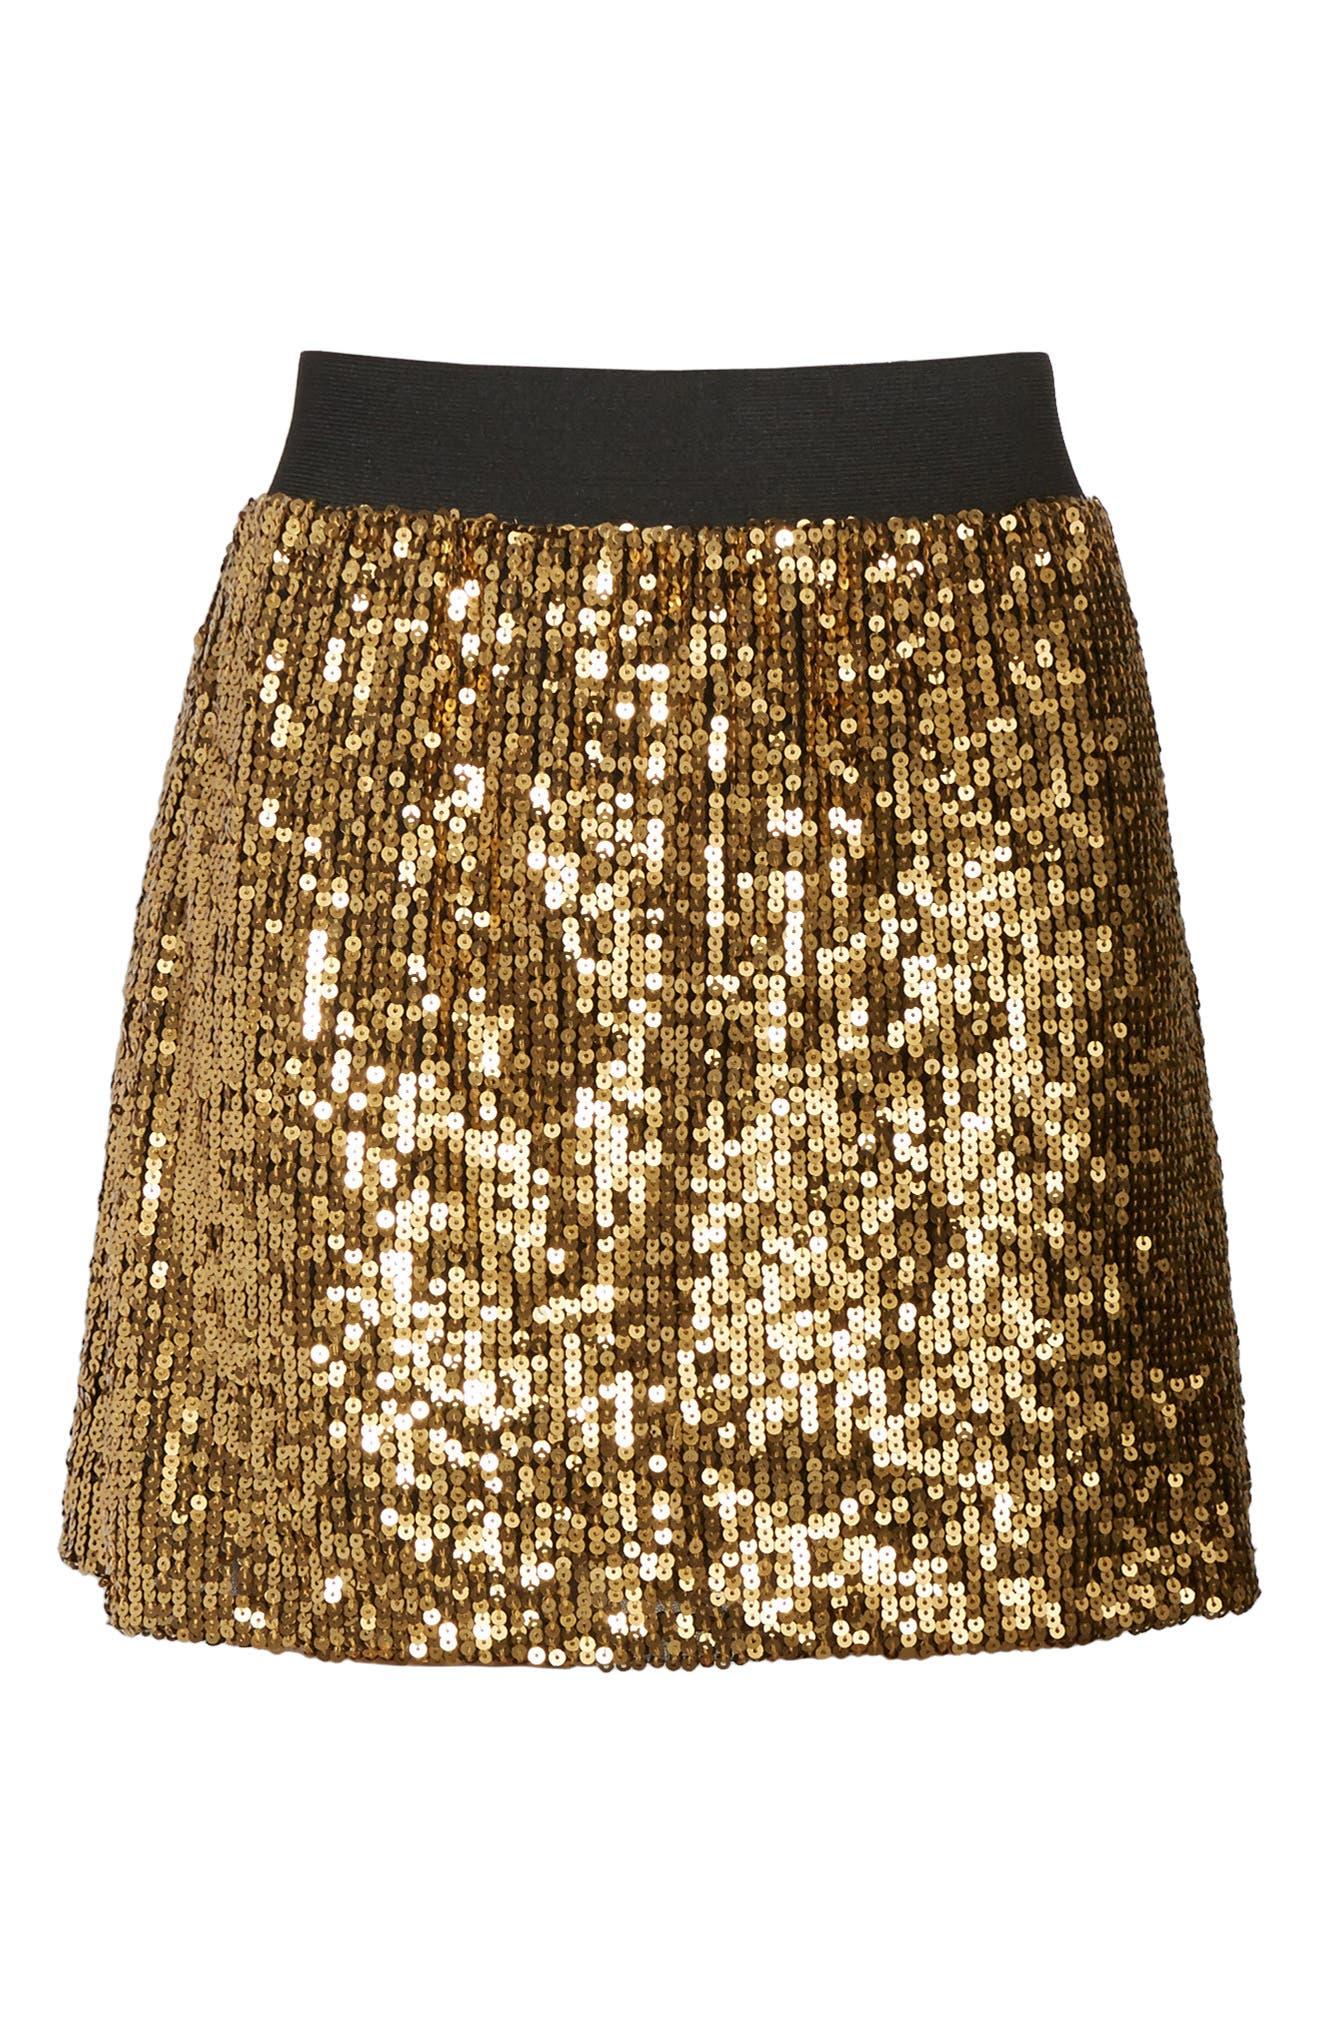 Sequin Miniskirt,                             Alternate thumbnail 5, color,                             Metallic Gold